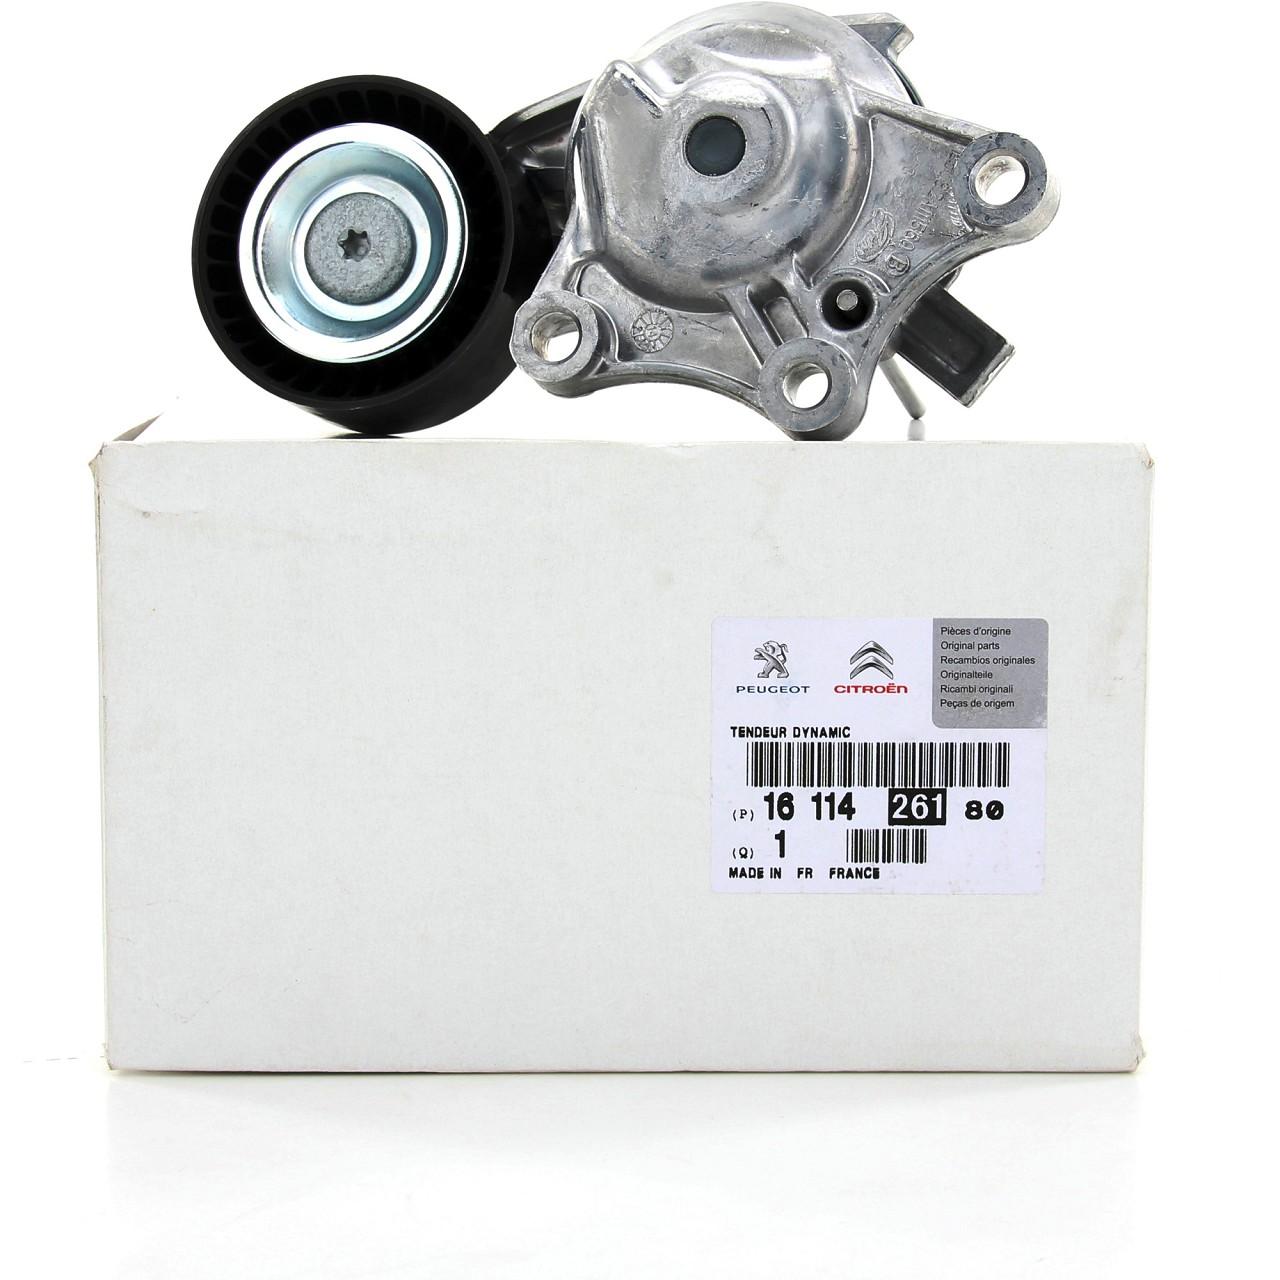 ORIGINAL Citroen Peugeot Spannrolle Keilrippenriemen 1611426180